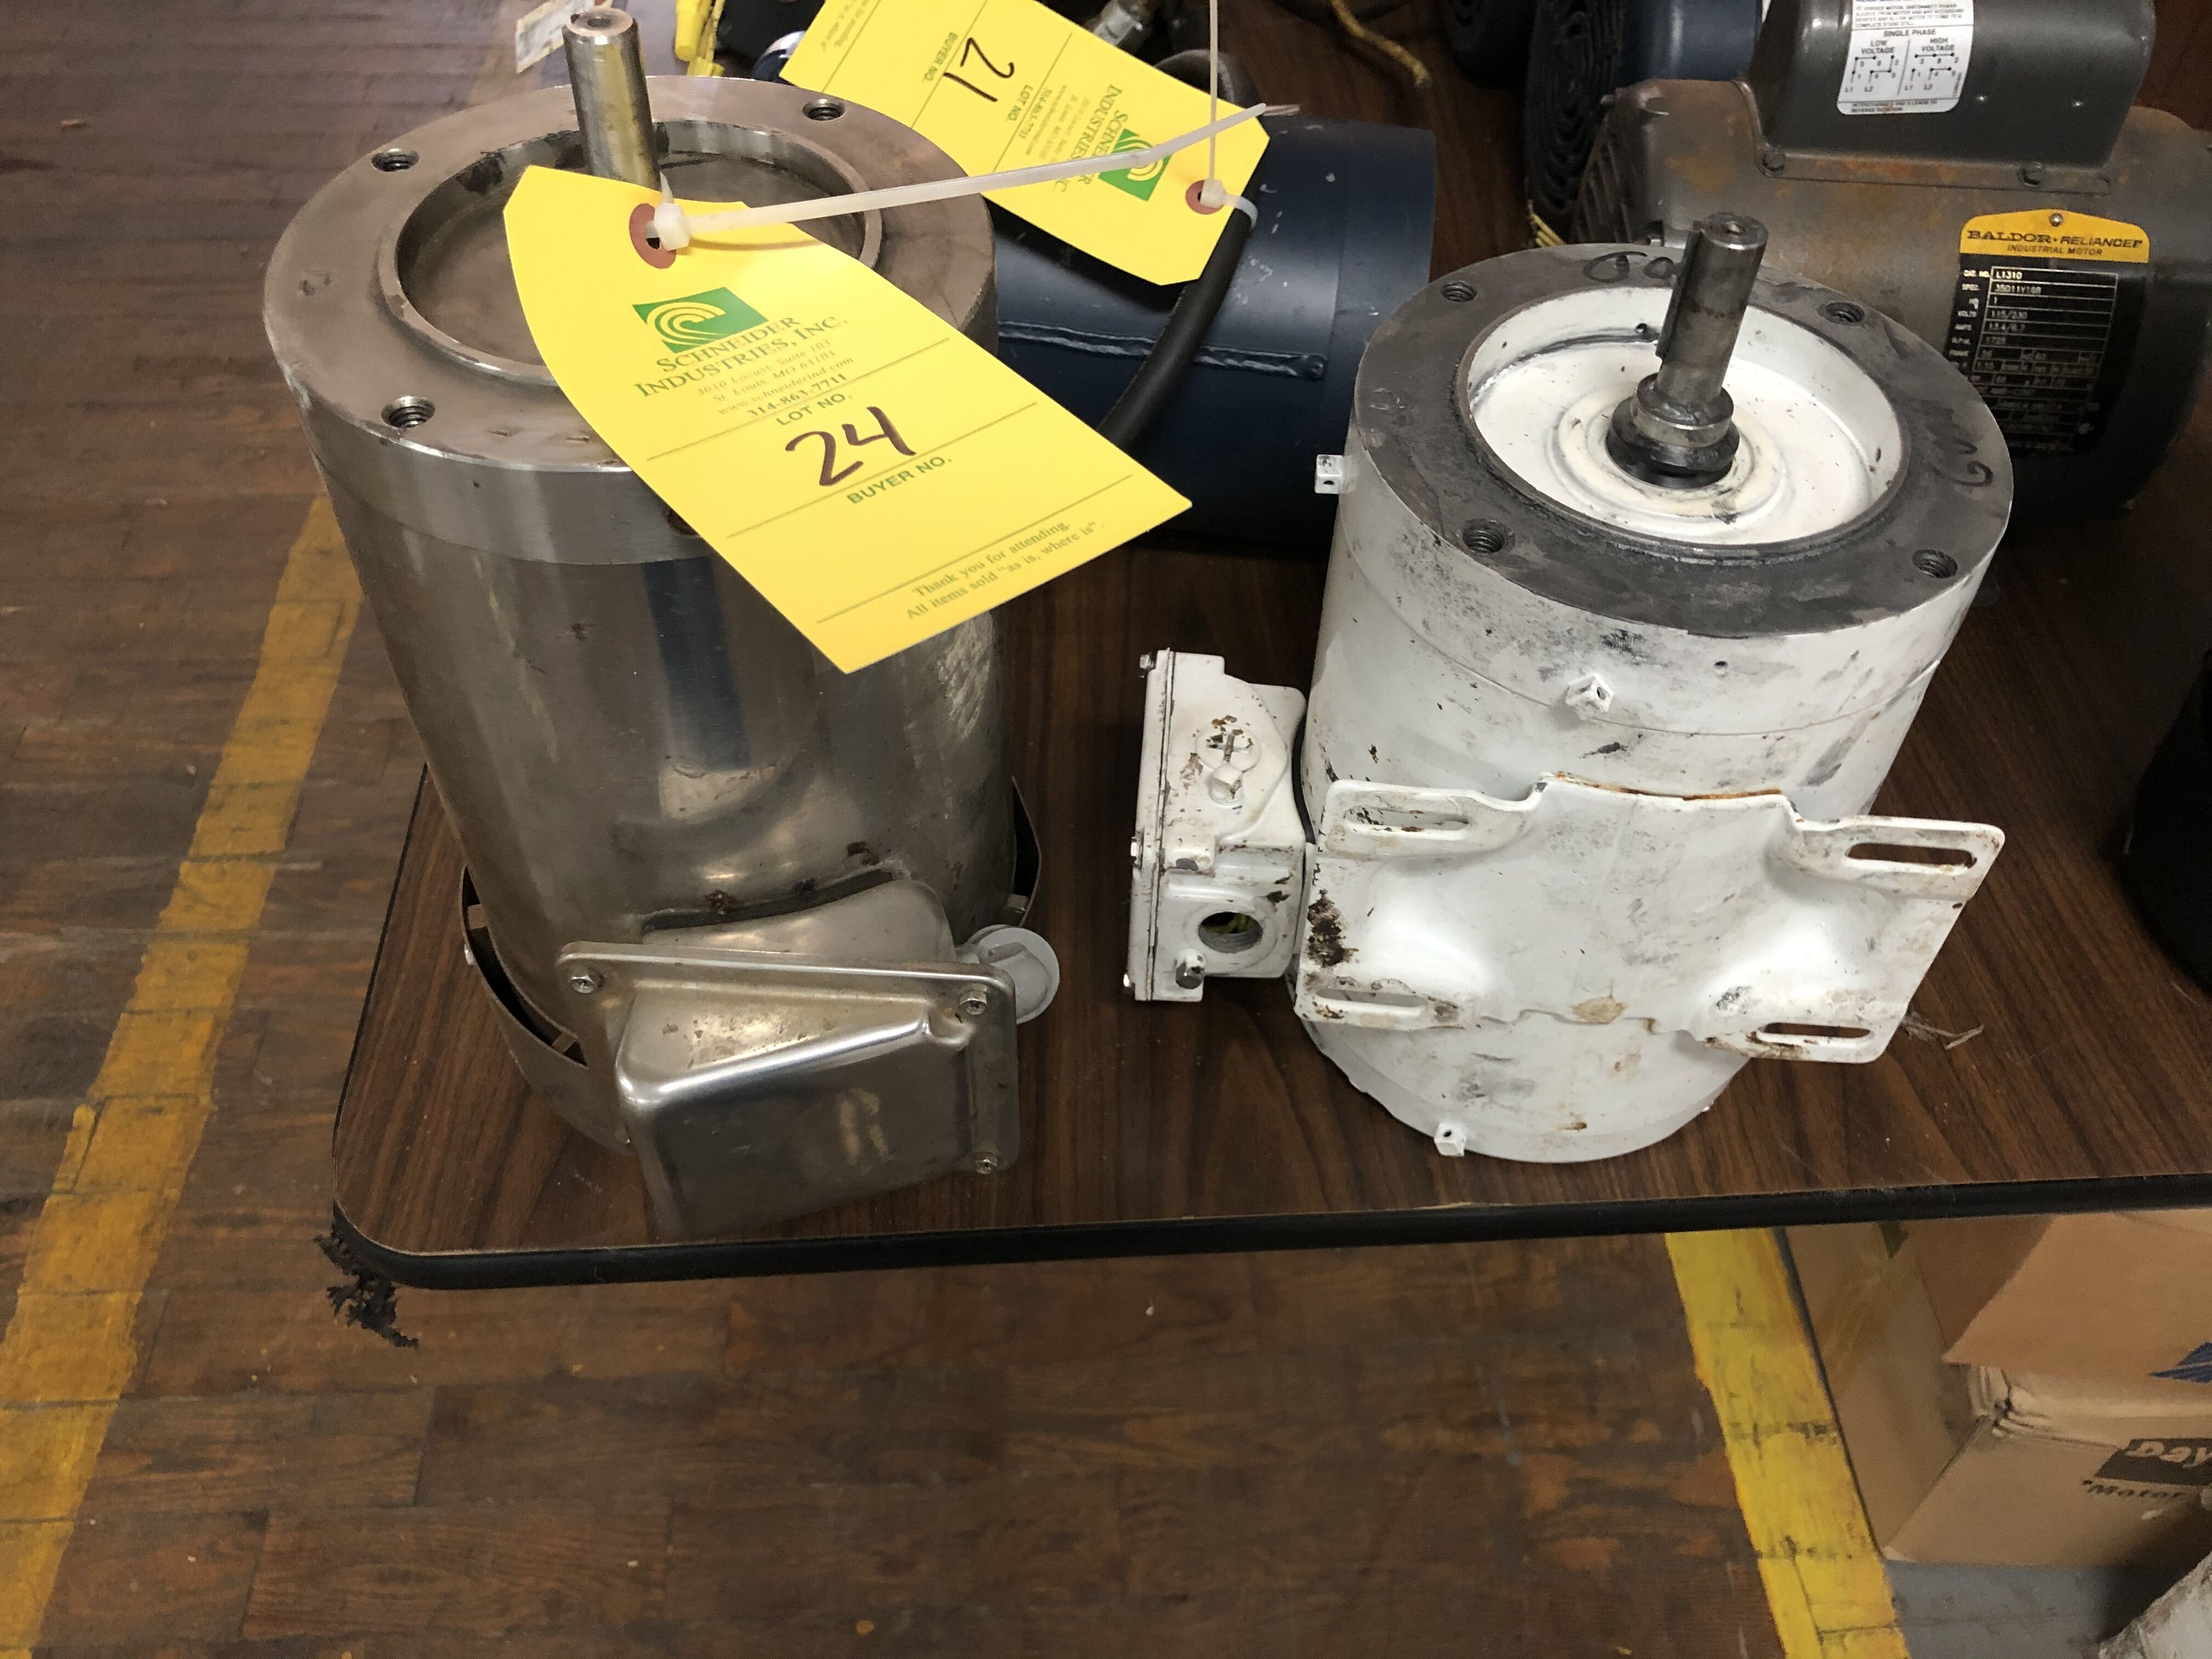 Lot 24 - (2) Motors, Nema 3/4 HP, FHP Washguard 2HP